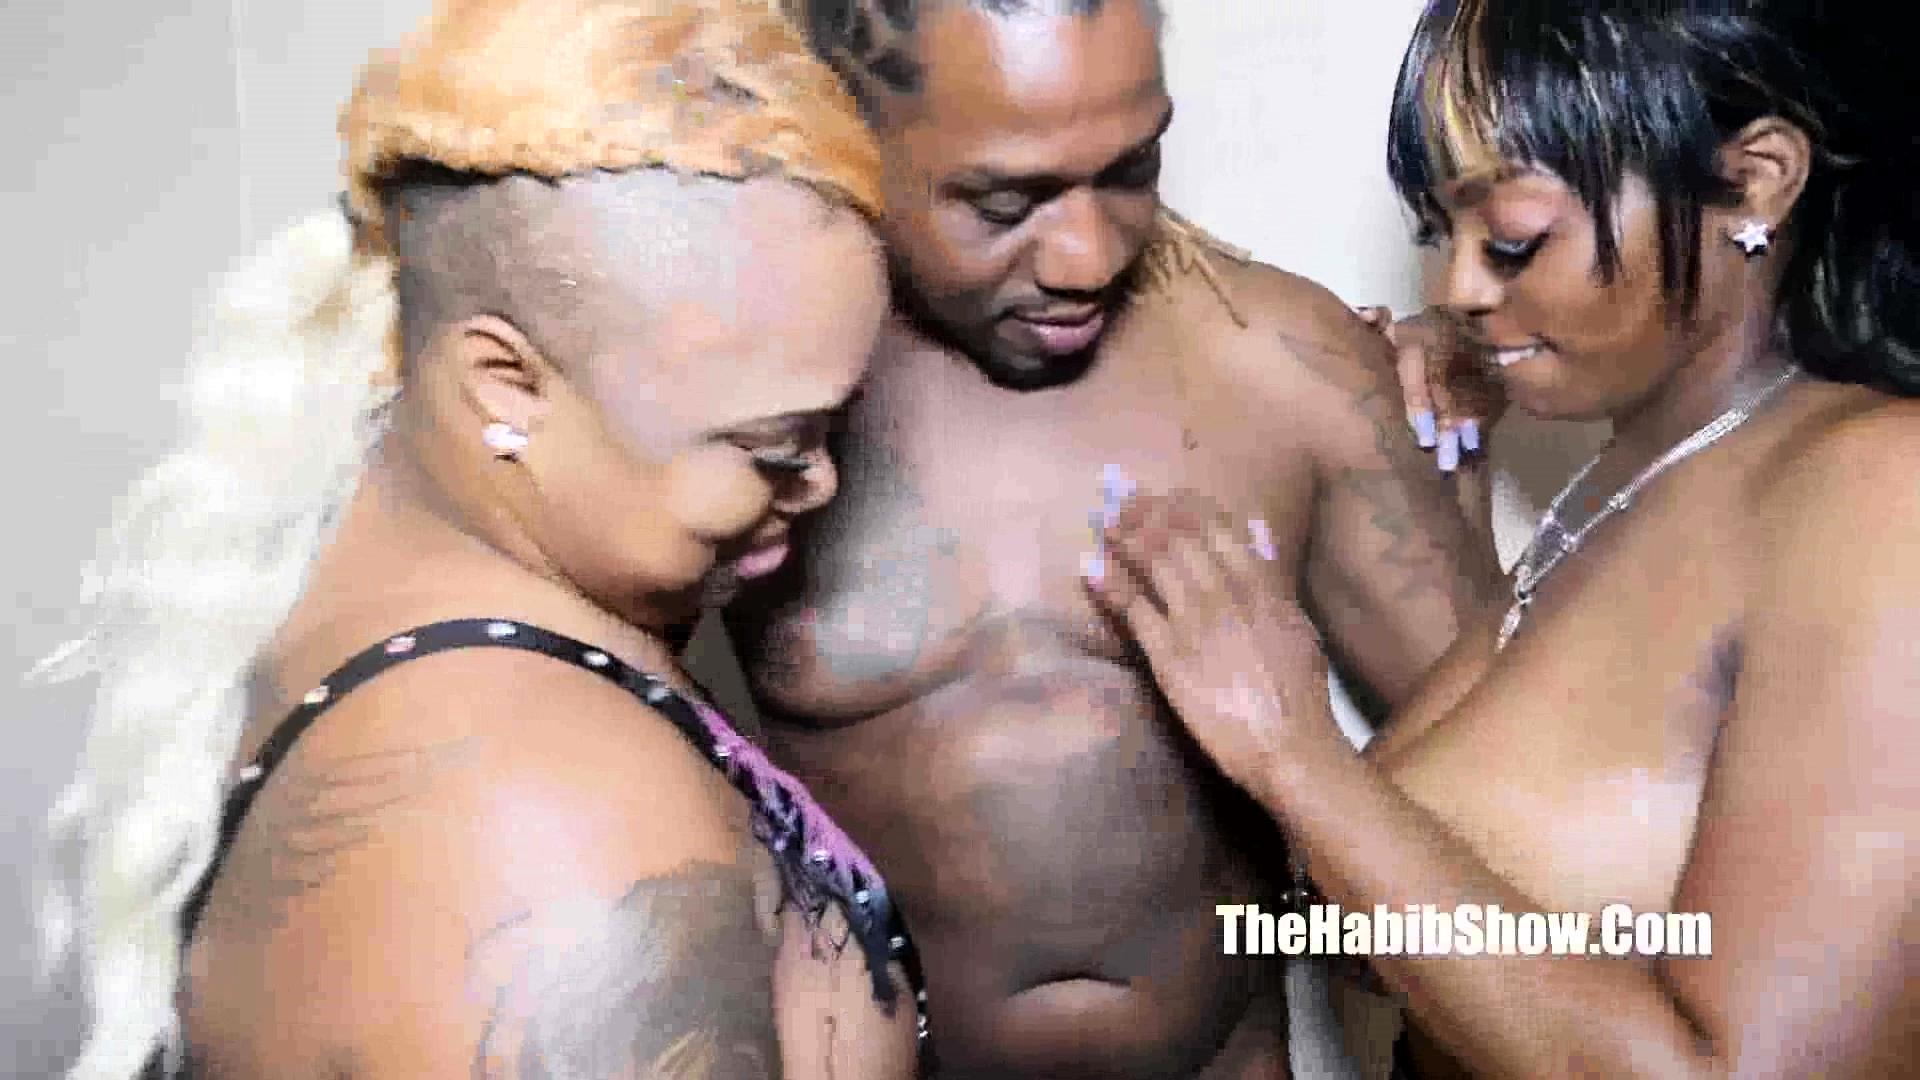 Ryan Conner Bbc Threesome